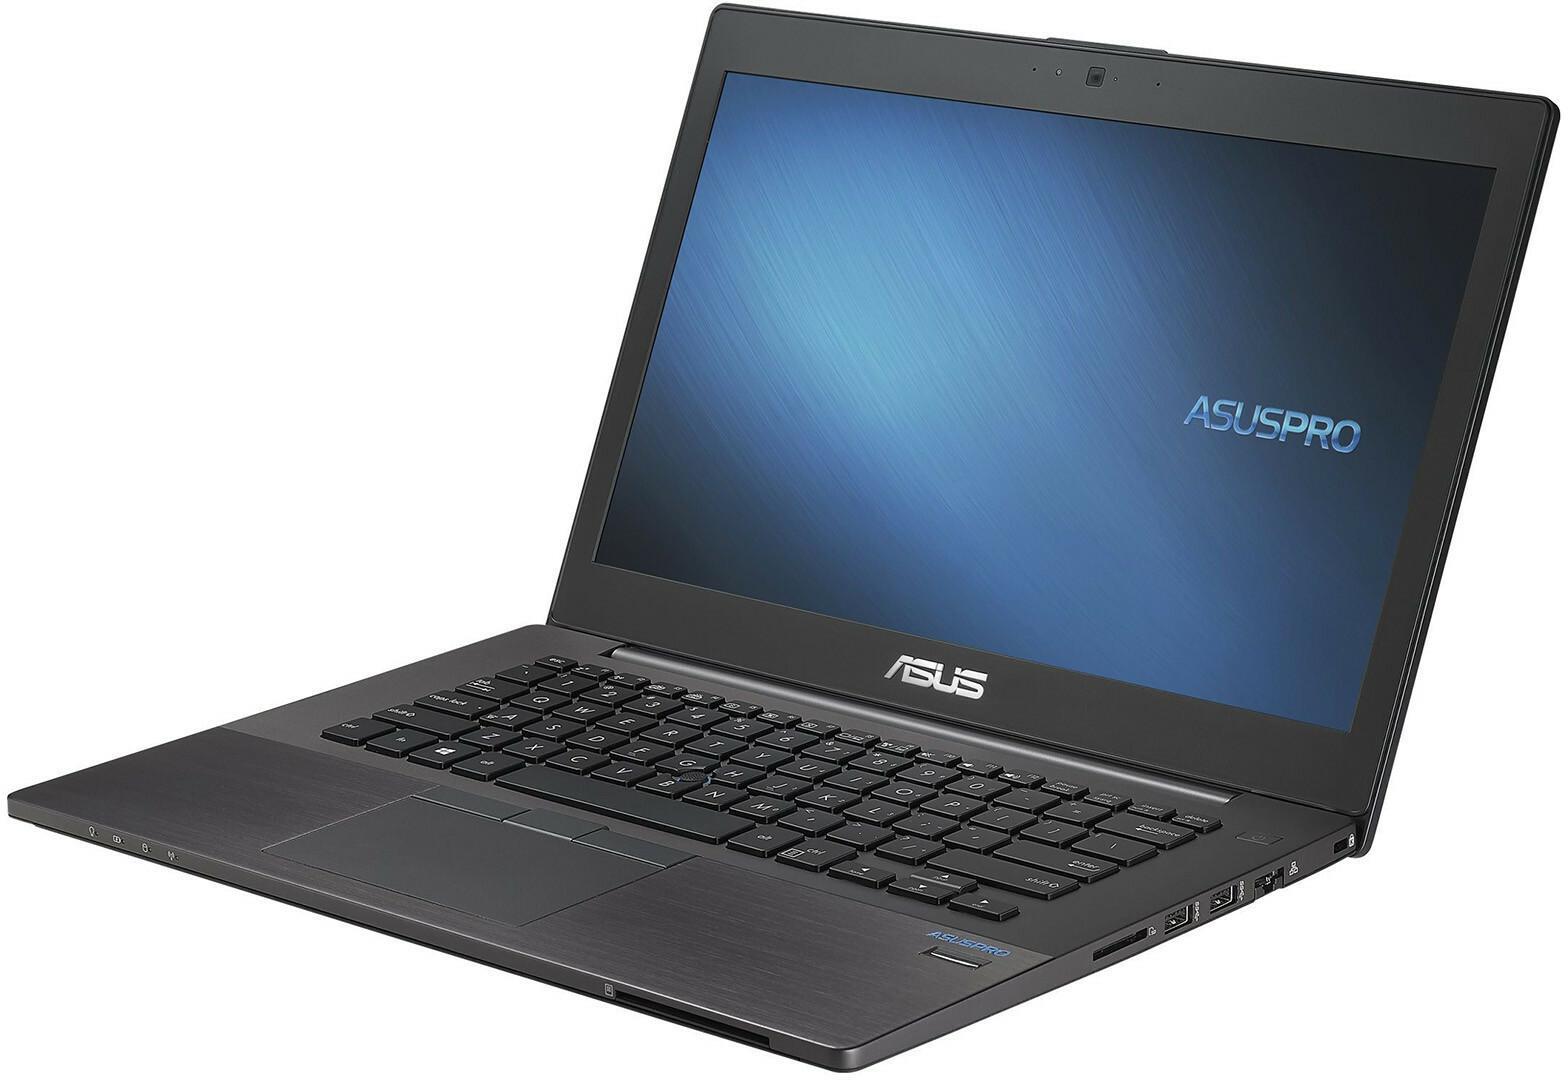 "Asus B8430UA-FA0064E 14"", Core i5 2,3GHz, 4GB RAM, 500GB HDD (B8430UA-FA0064E)"